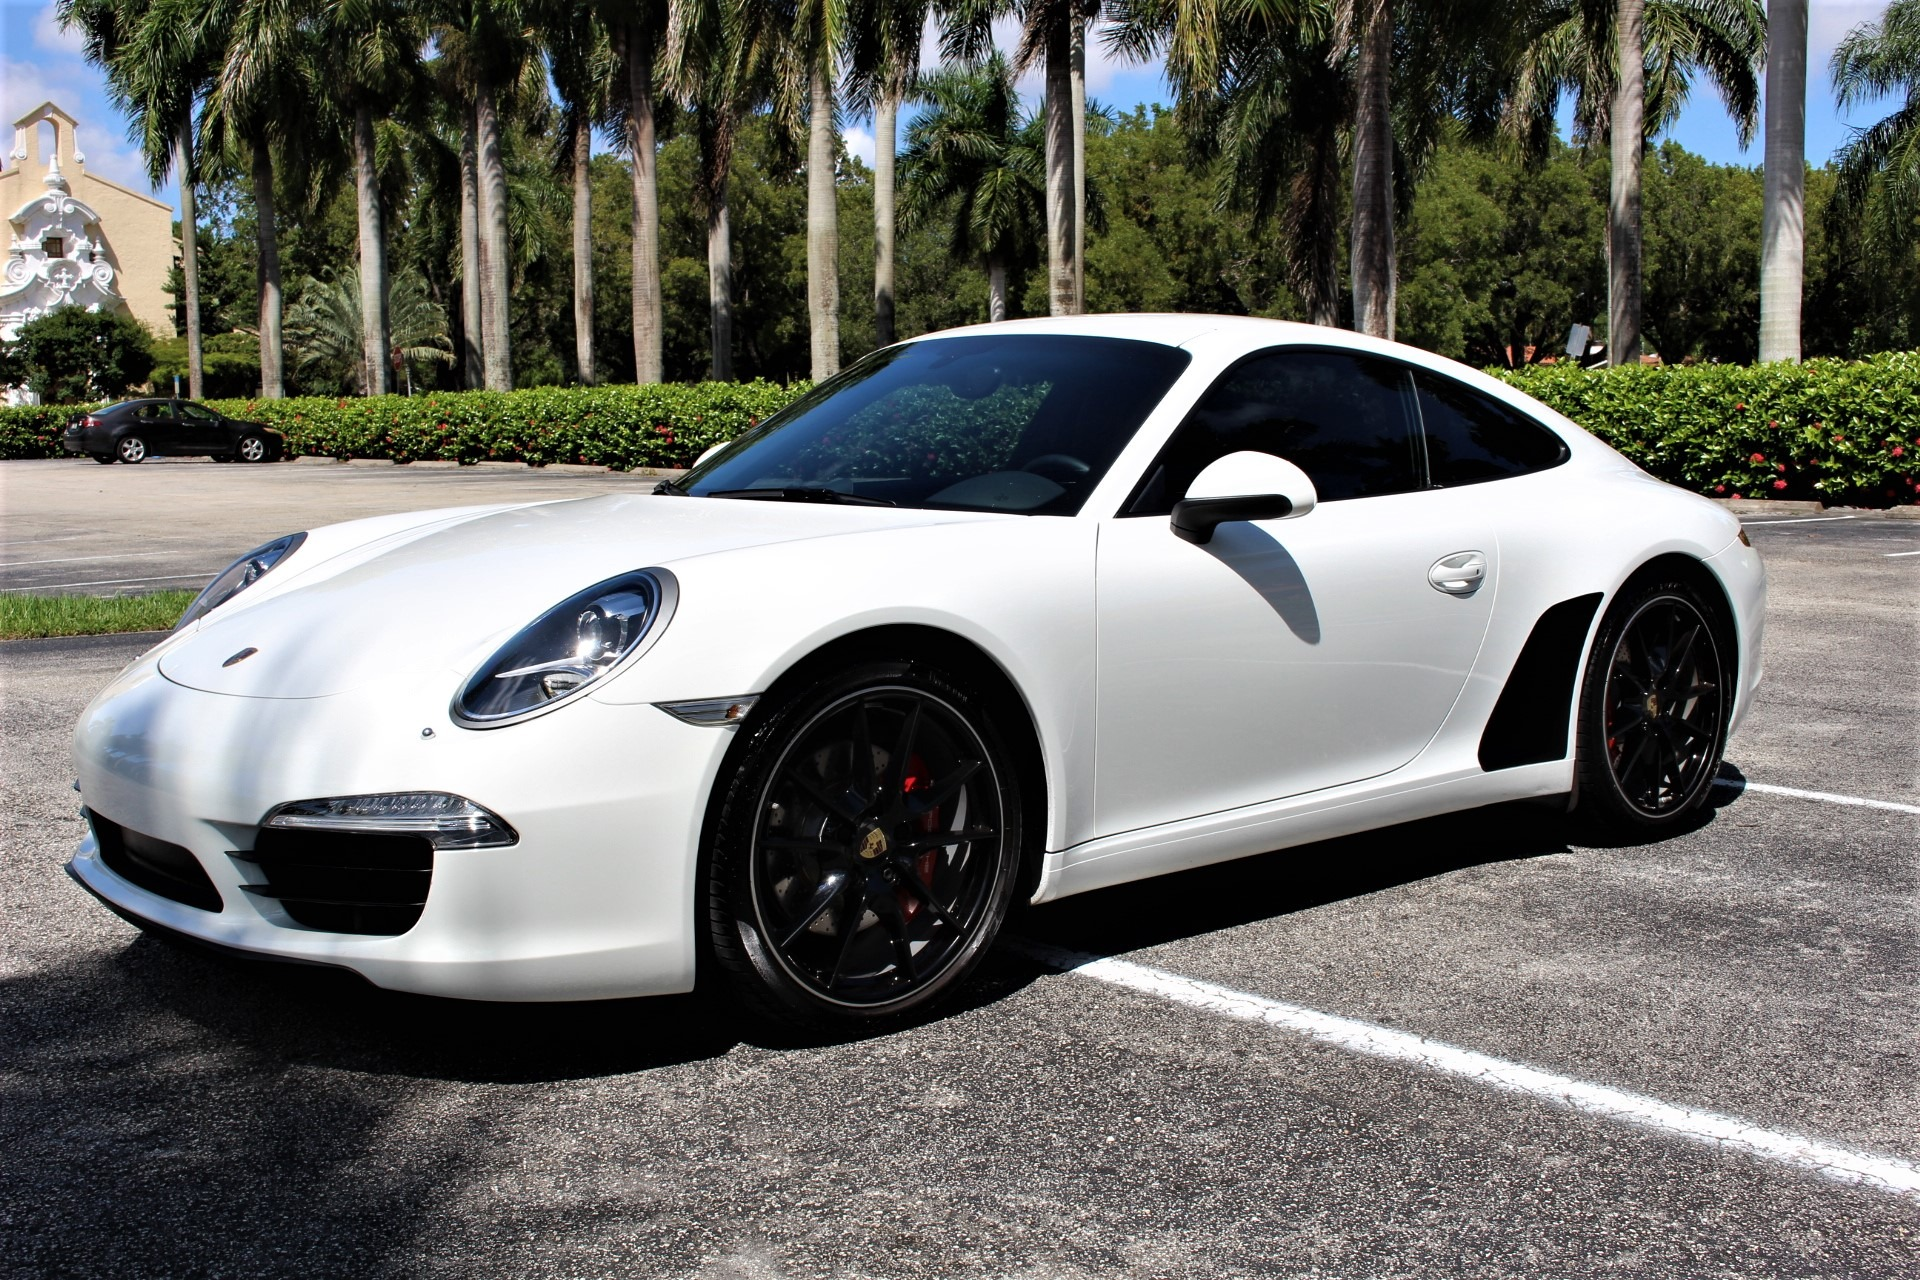 Used 2013 Porsche 911 Carrera S for sale $67,850 at The Gables Sports Cars in Miami FL 33146 4